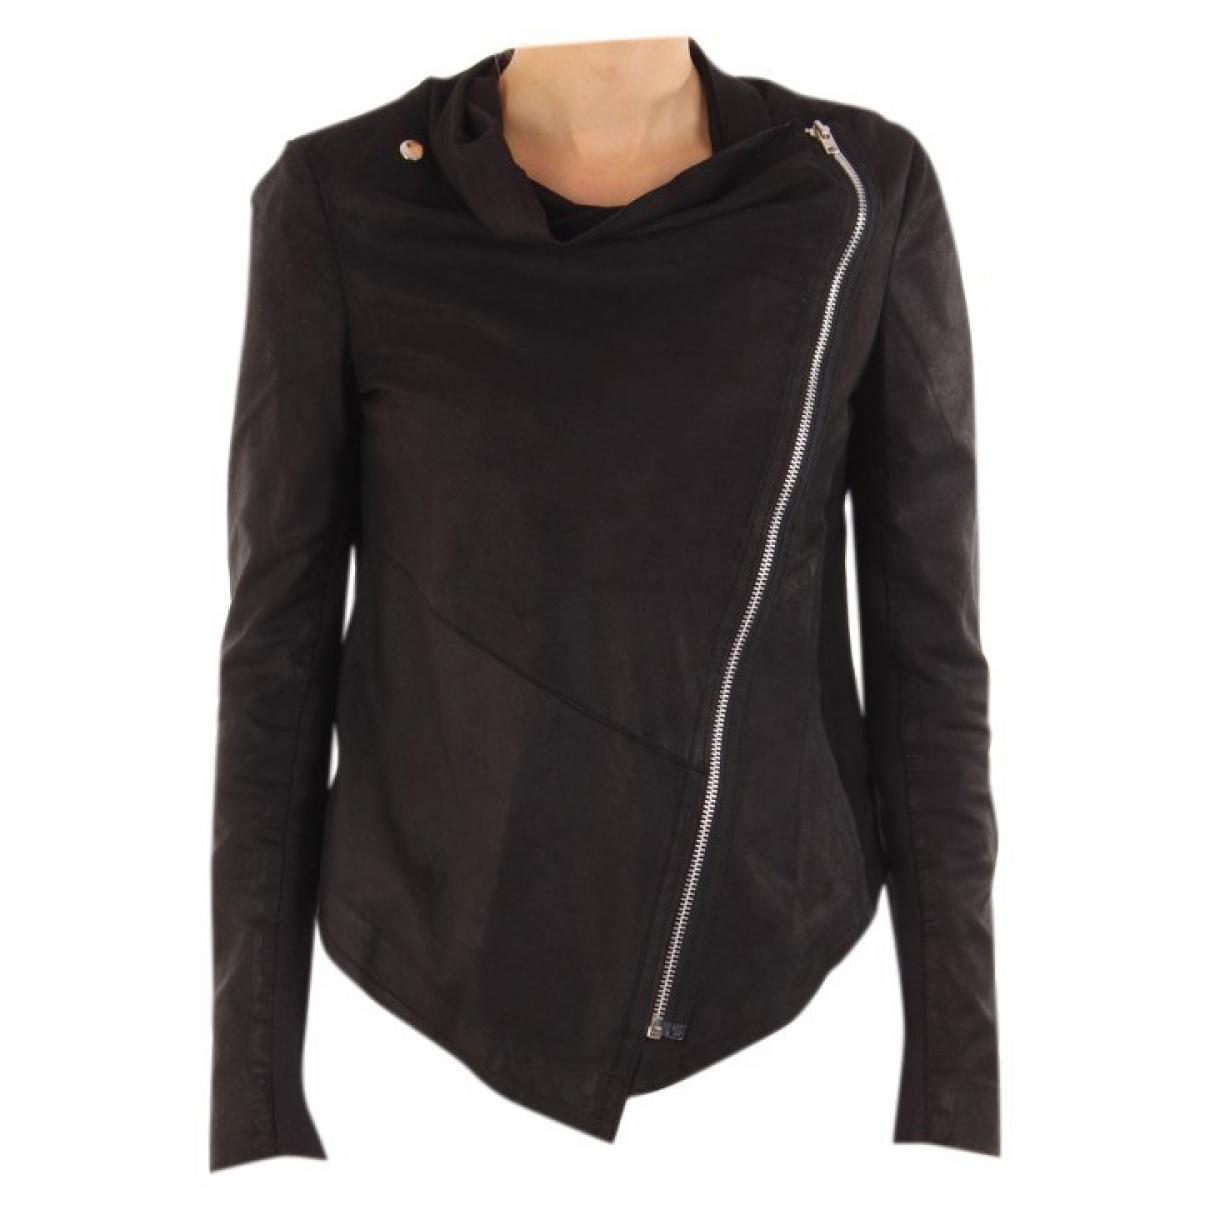 Muubaa \N Black Leather jacket for Women 36 FR